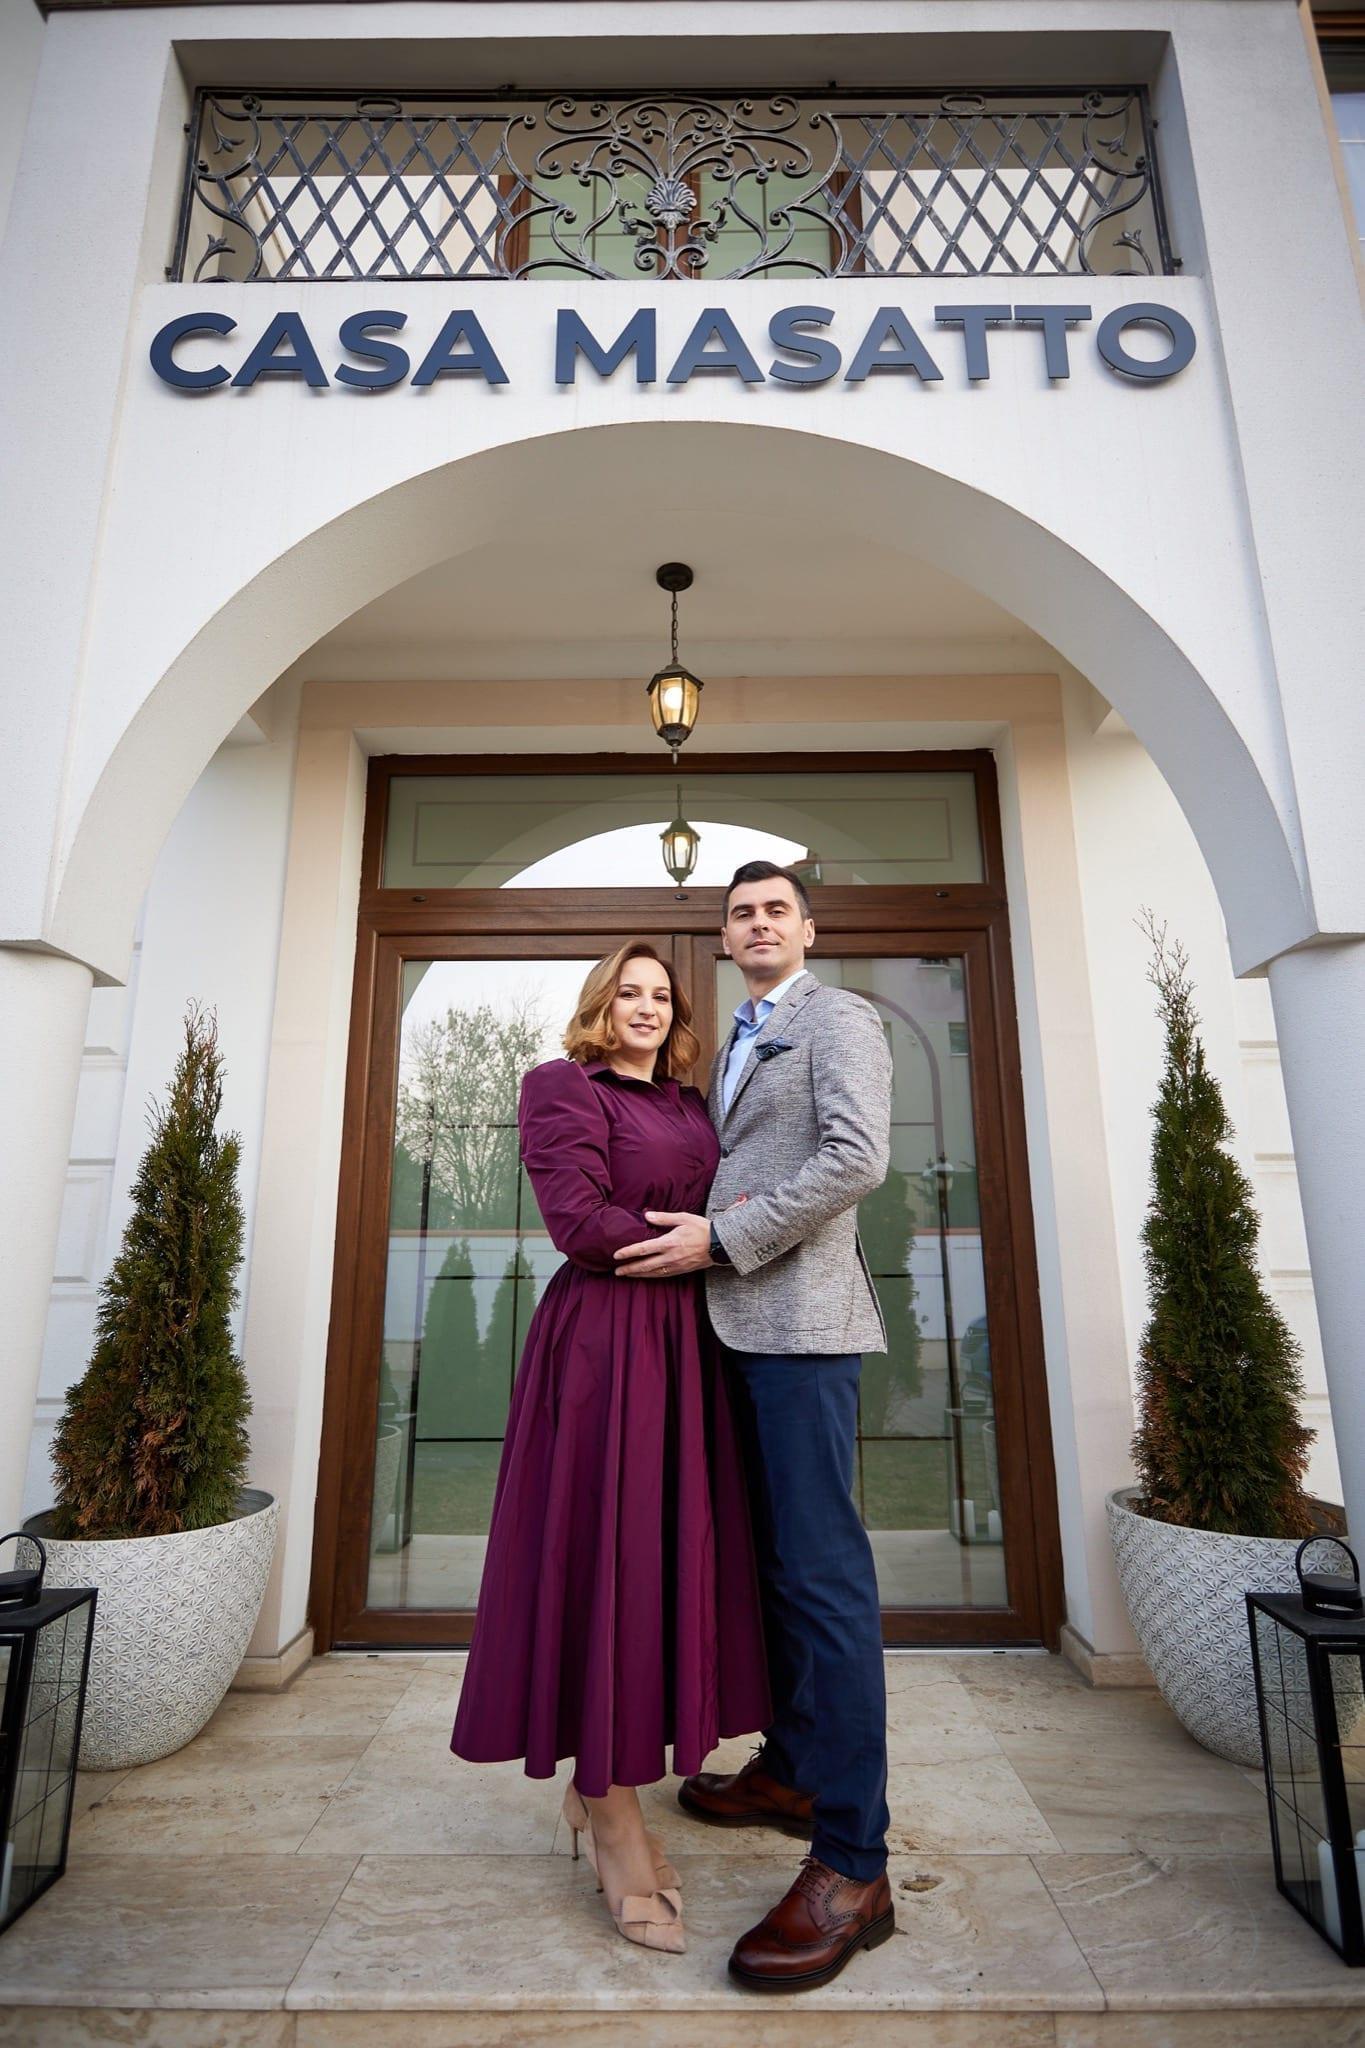 Masatto 19 Februarie 0570 copy - Casa Masatto, showroom-ul concept unde fotoliile de masaj redefinesc un stil de viață